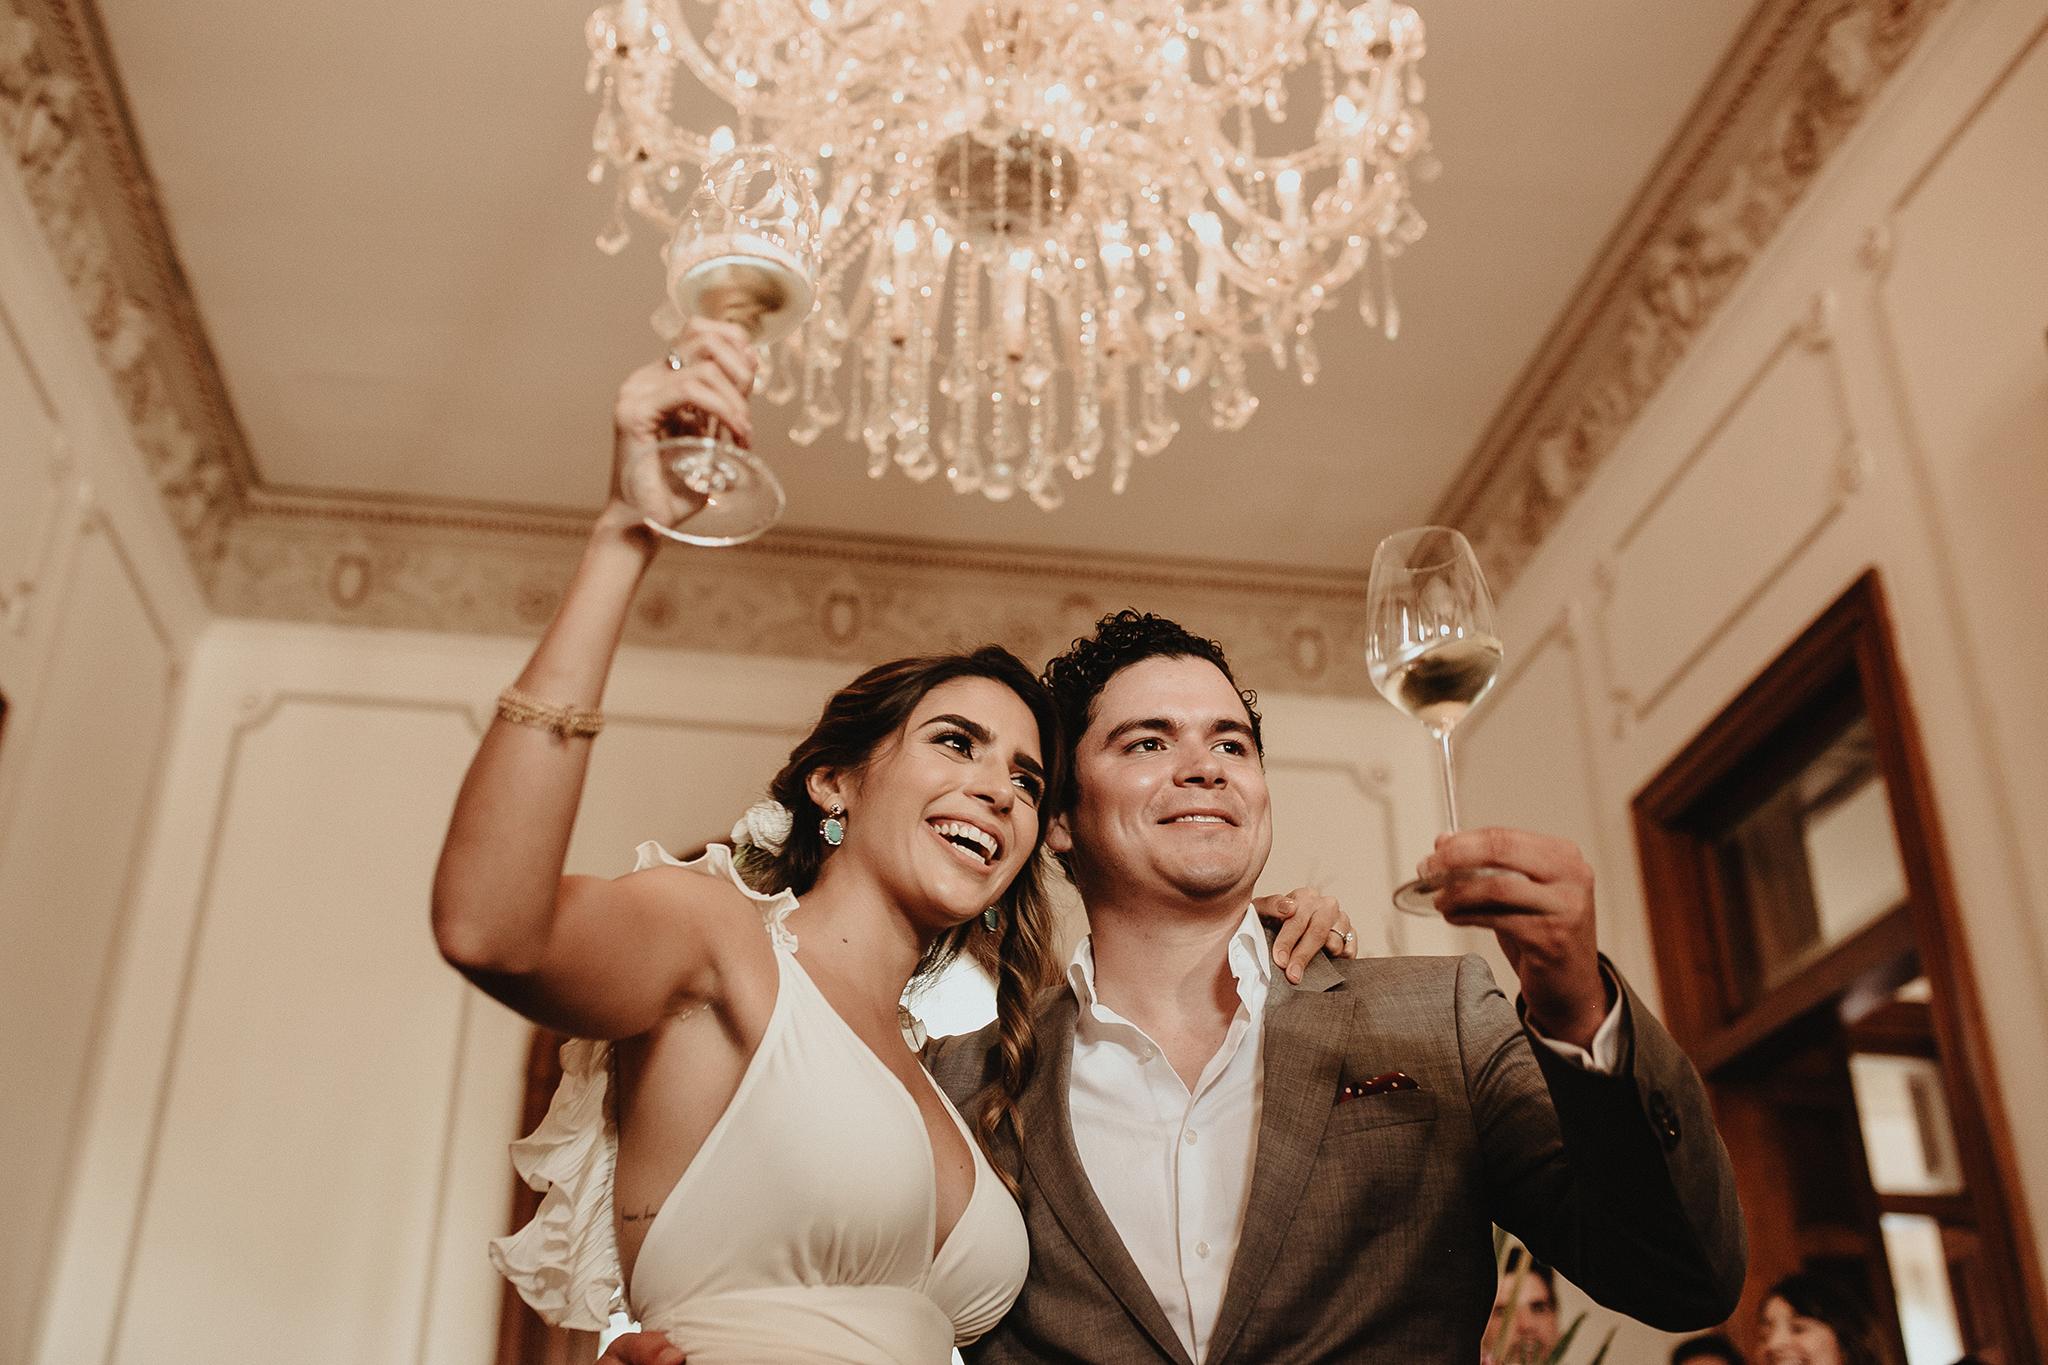 0130civil_Hacienda_WeddingDstination_MeridaYucatan_HaciendasMerida_BodasMexico_BodasYucatan_Boda_Destino.jpg